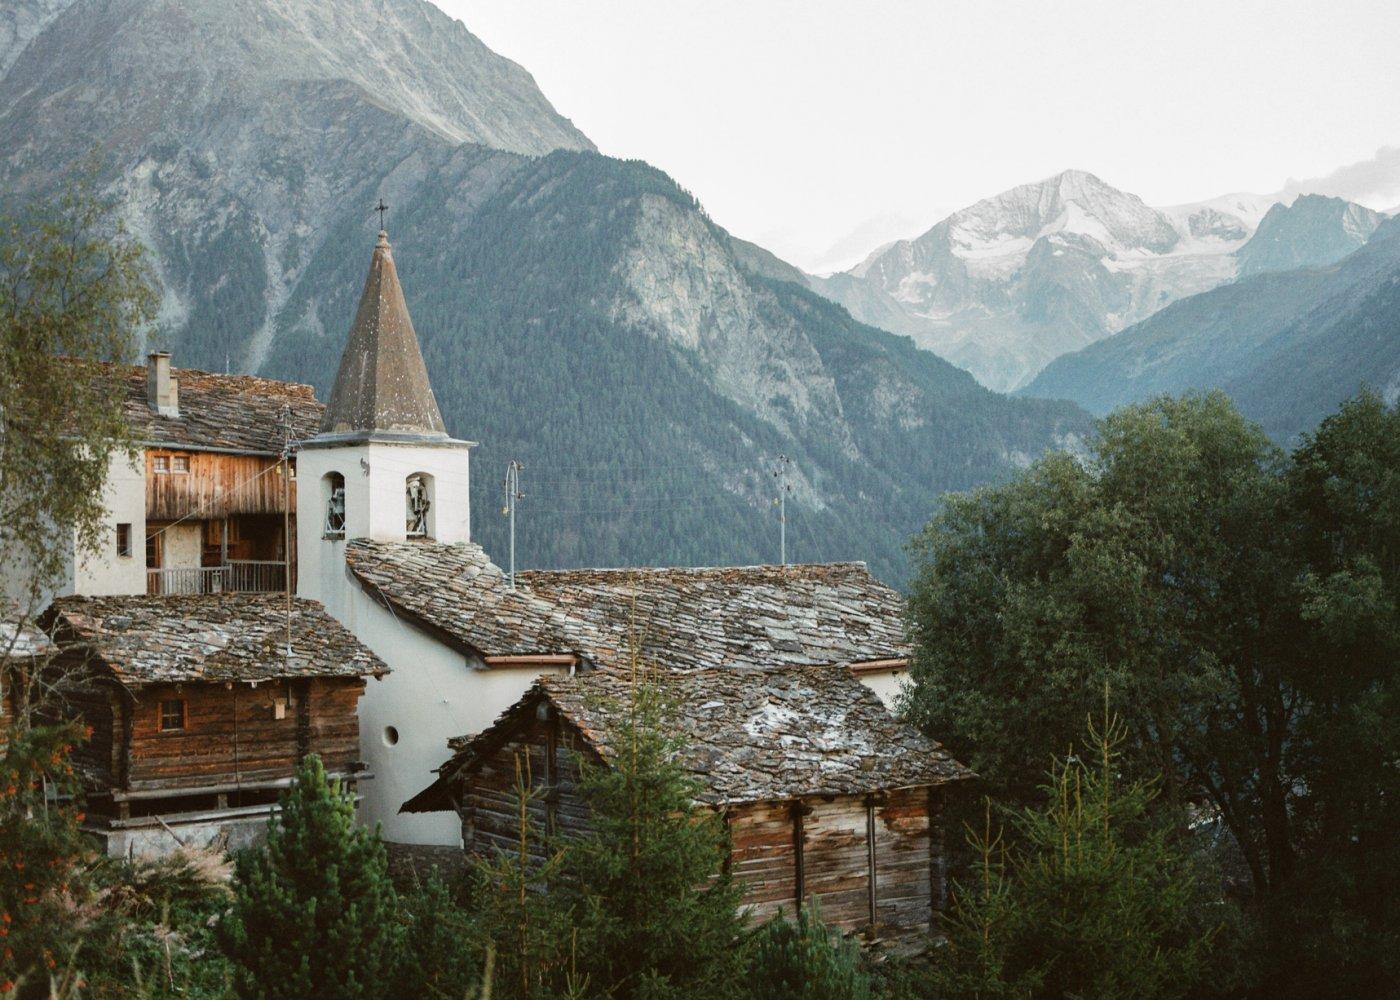 3. Les Rocs, les villages qui surplombent la vallée